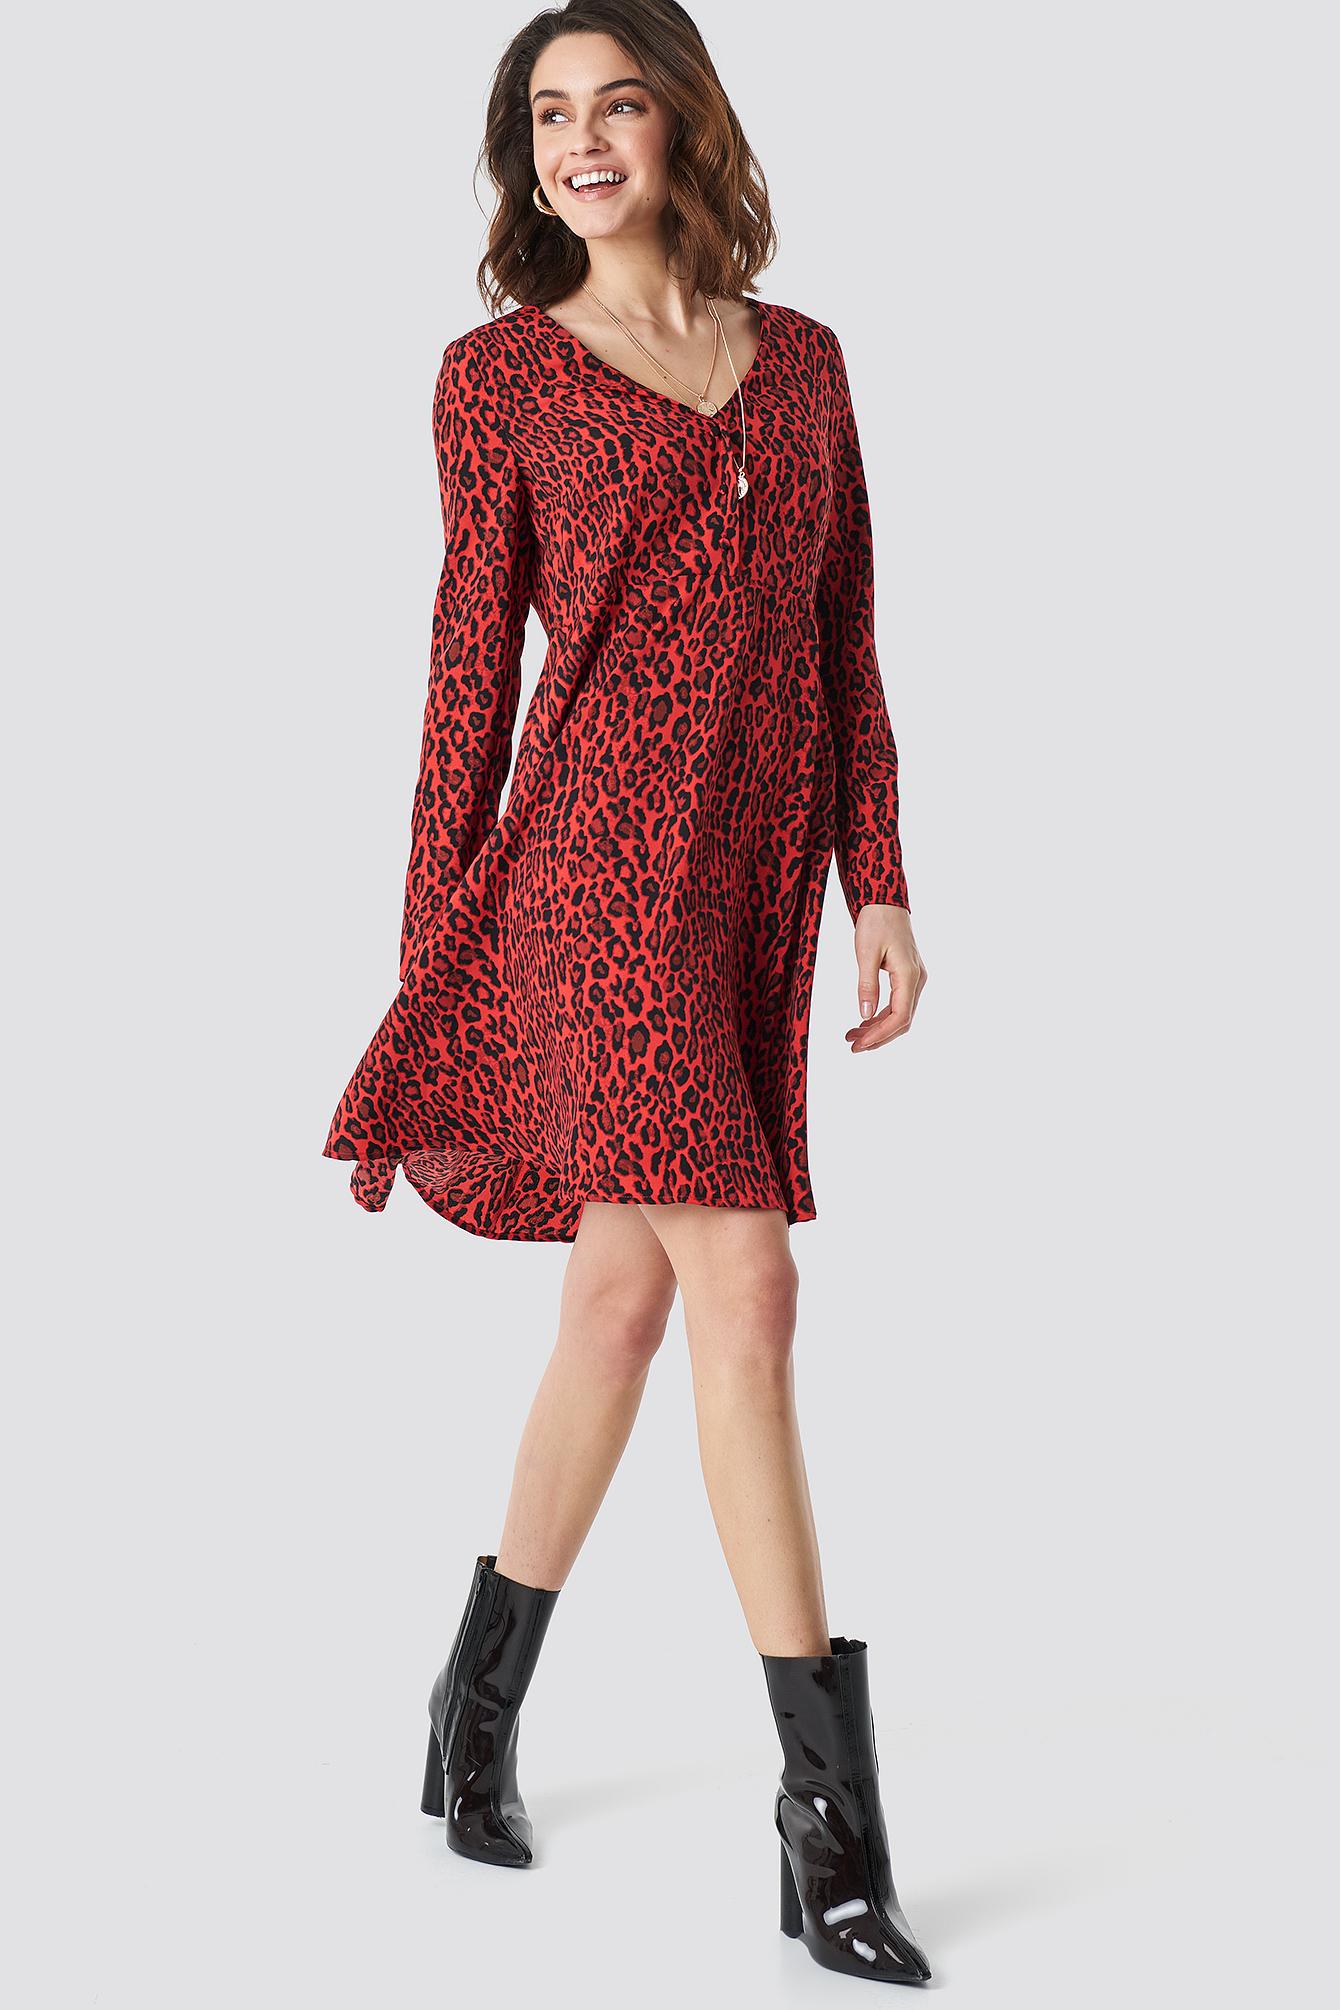 Leopard Print Button Up Ls Dress NA-KD.COM